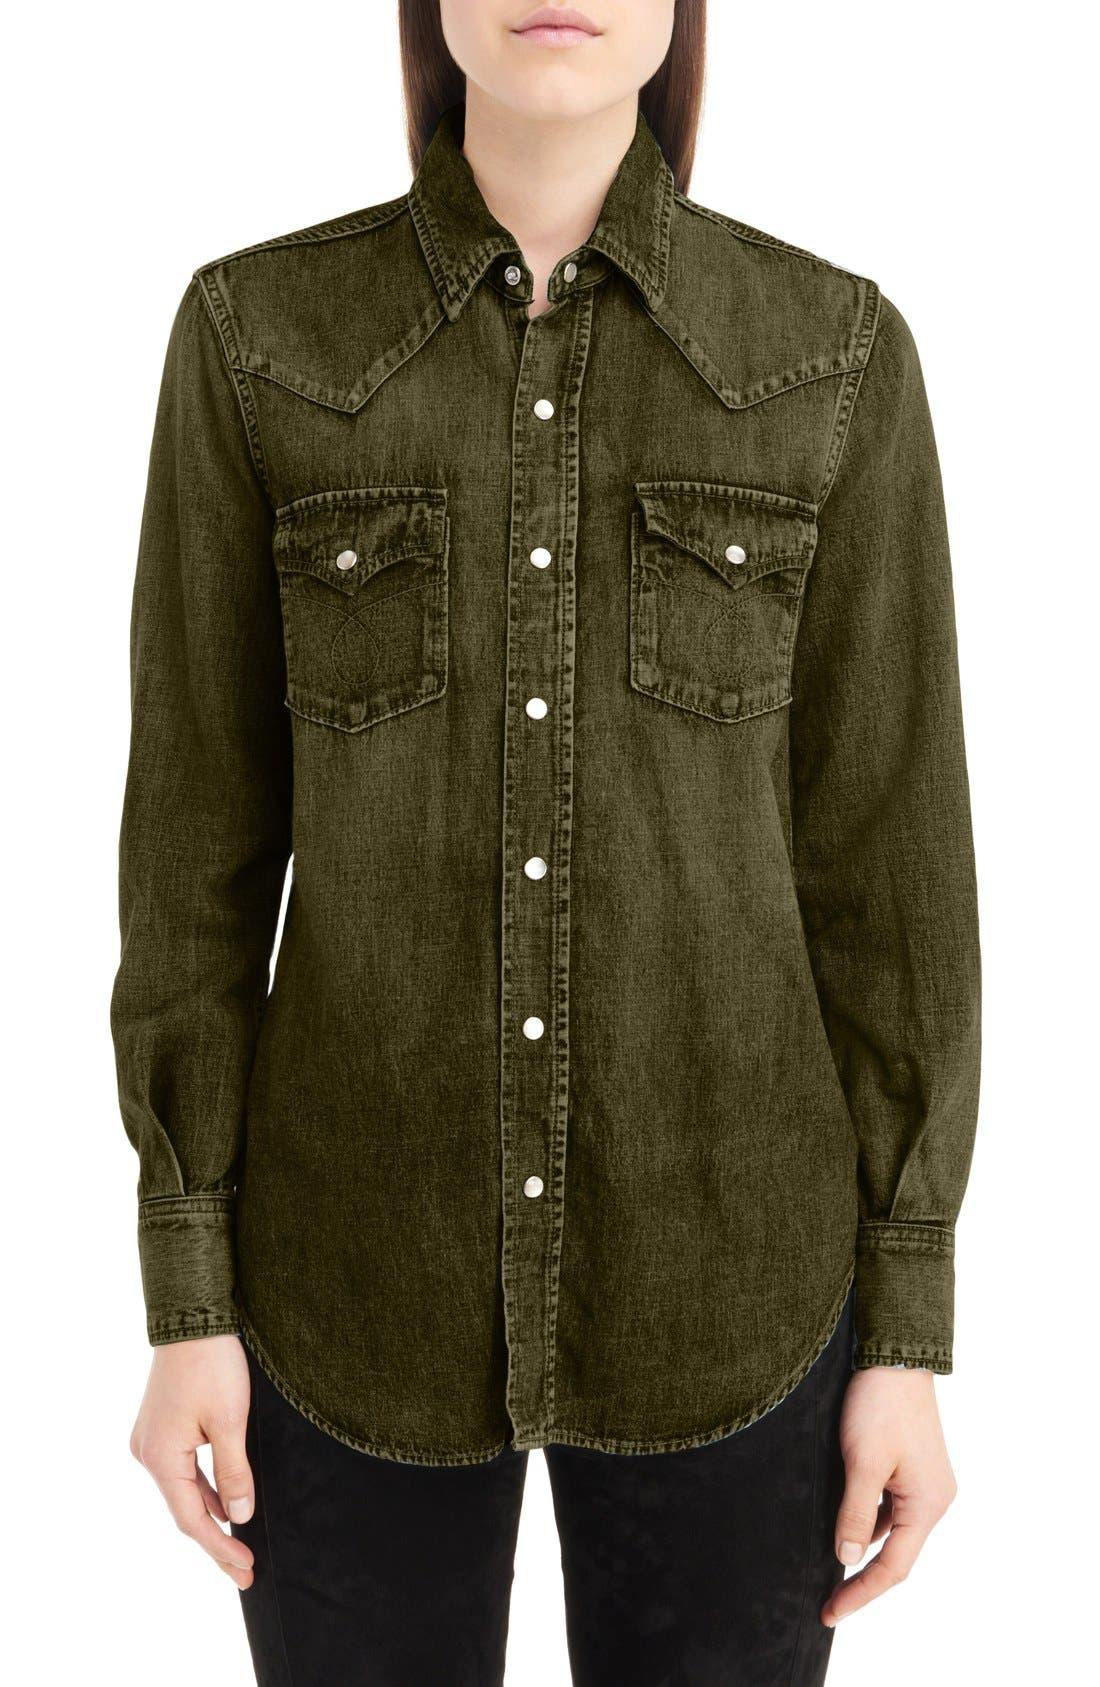 Saint Laurent Western Stitched Pocket Shirt